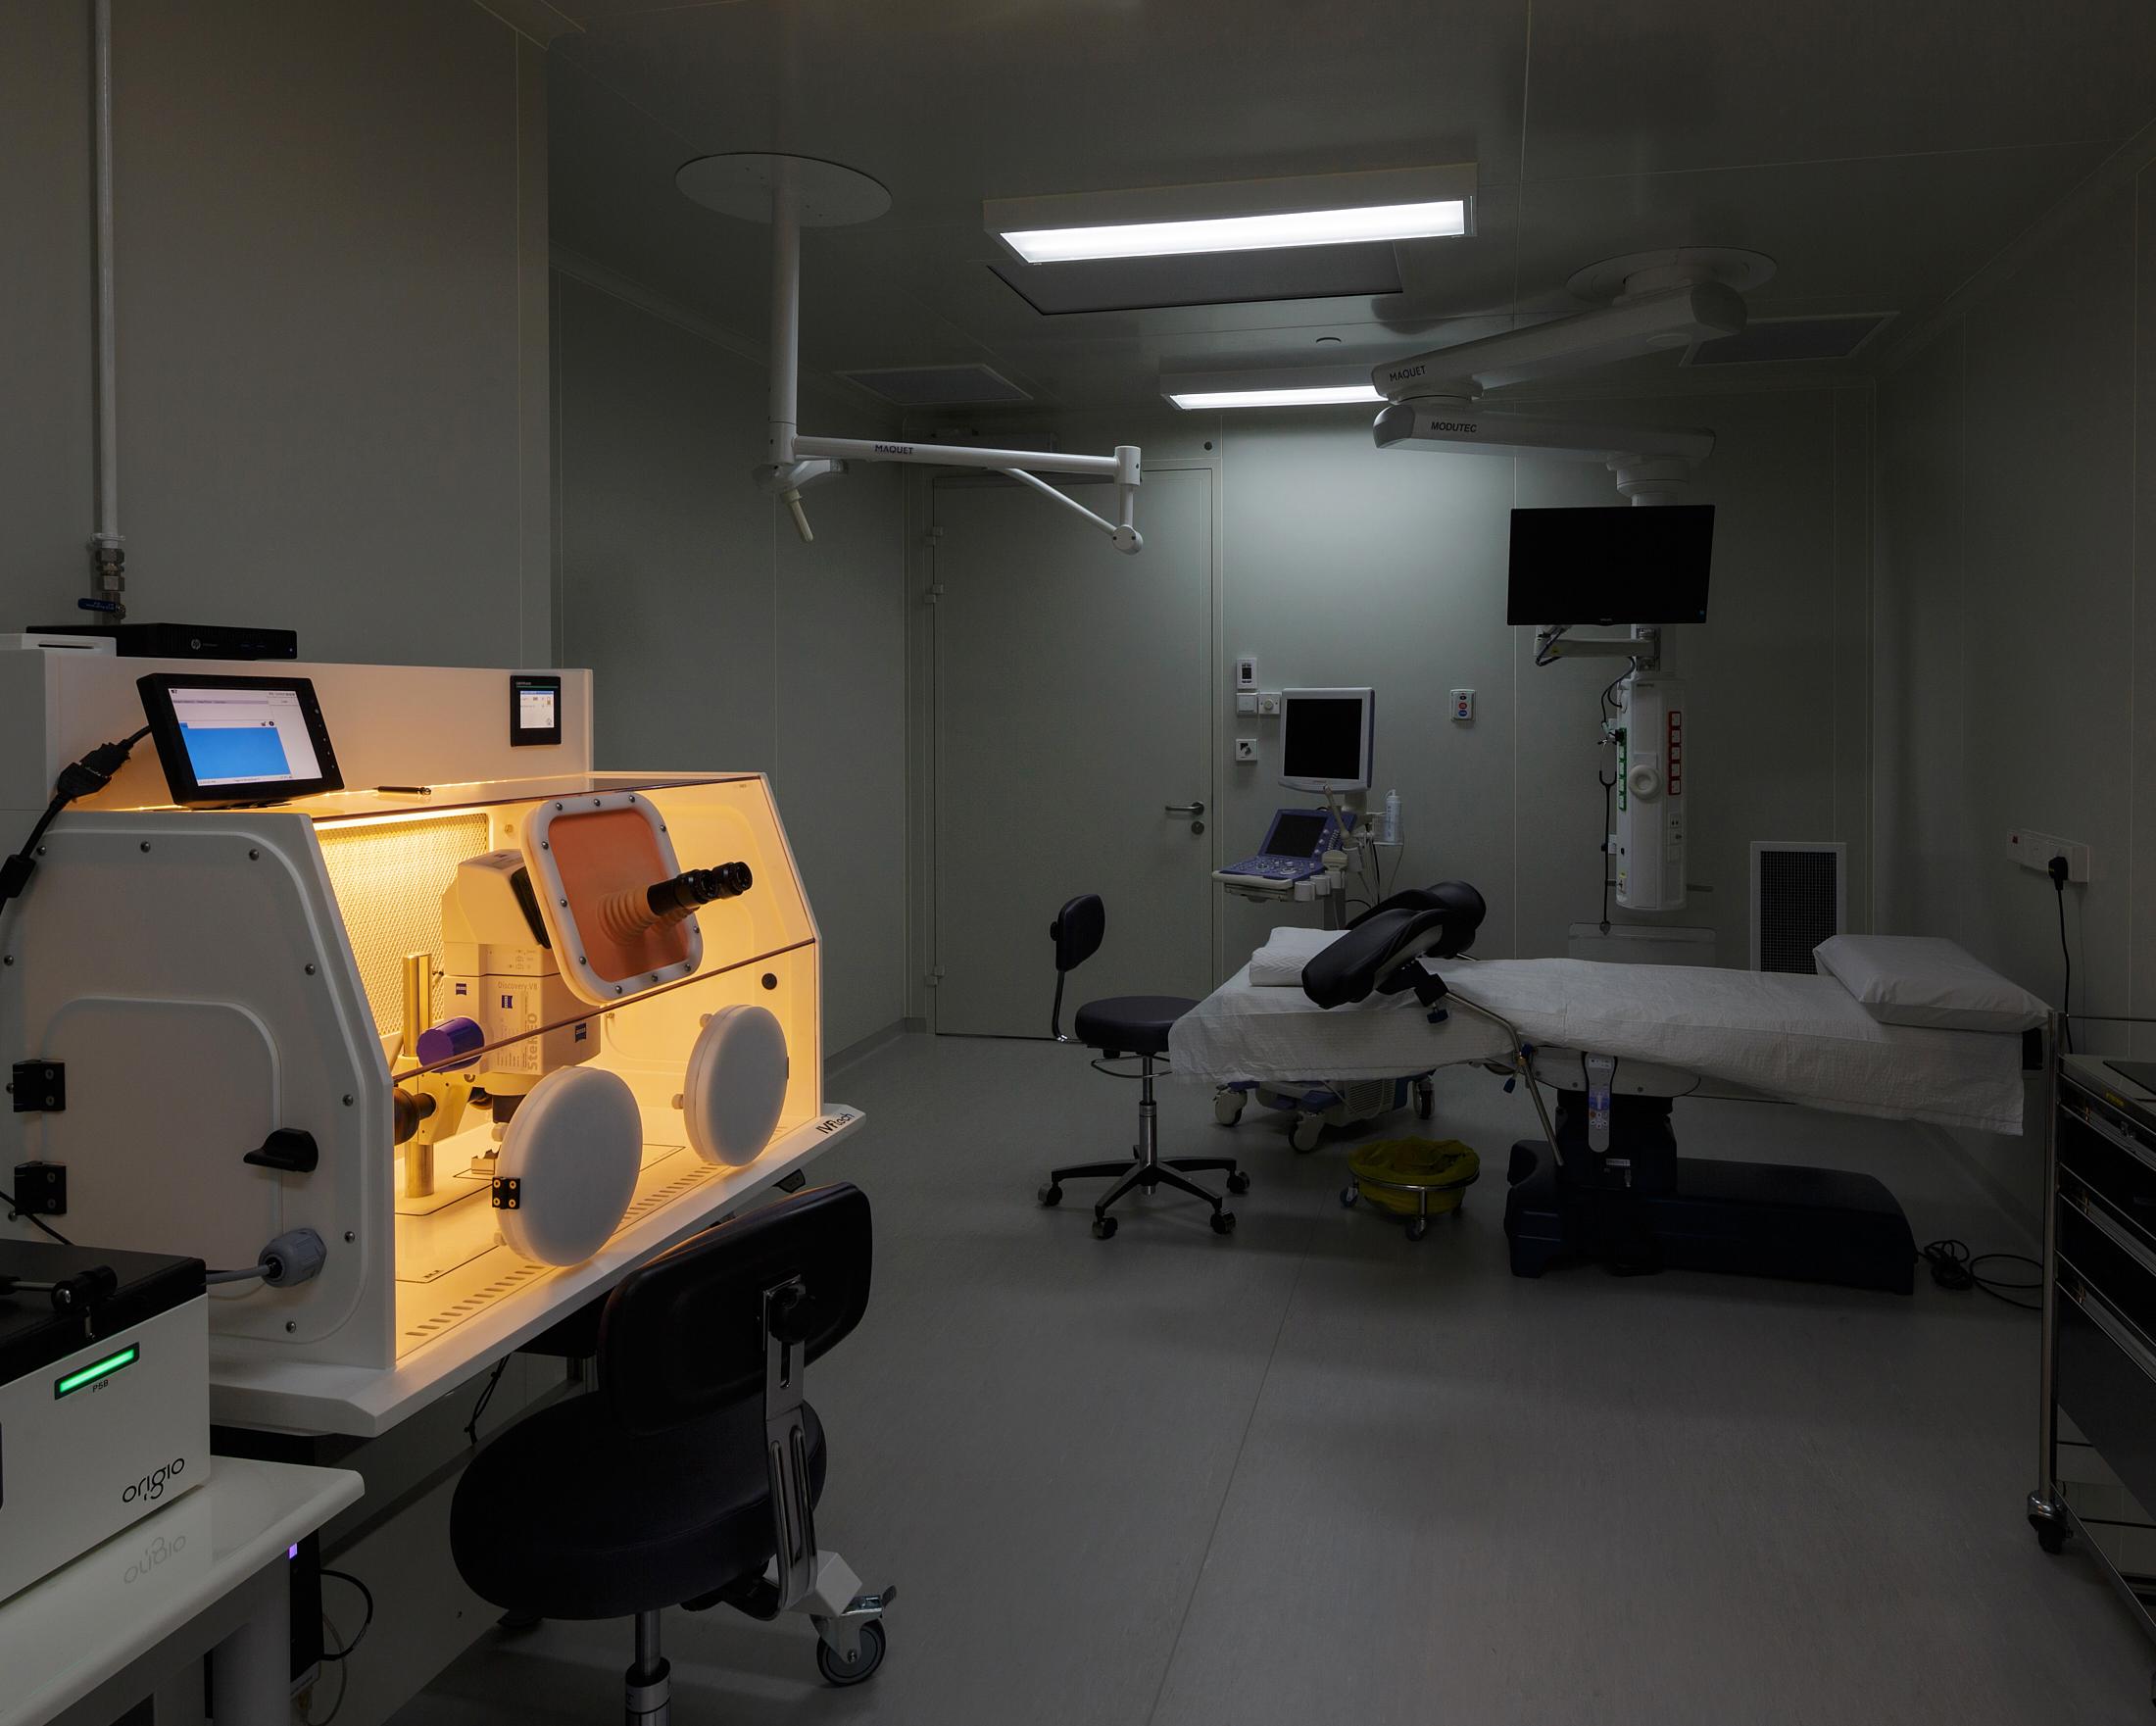 operating theatre   client: Virtus Fertility design: archlab